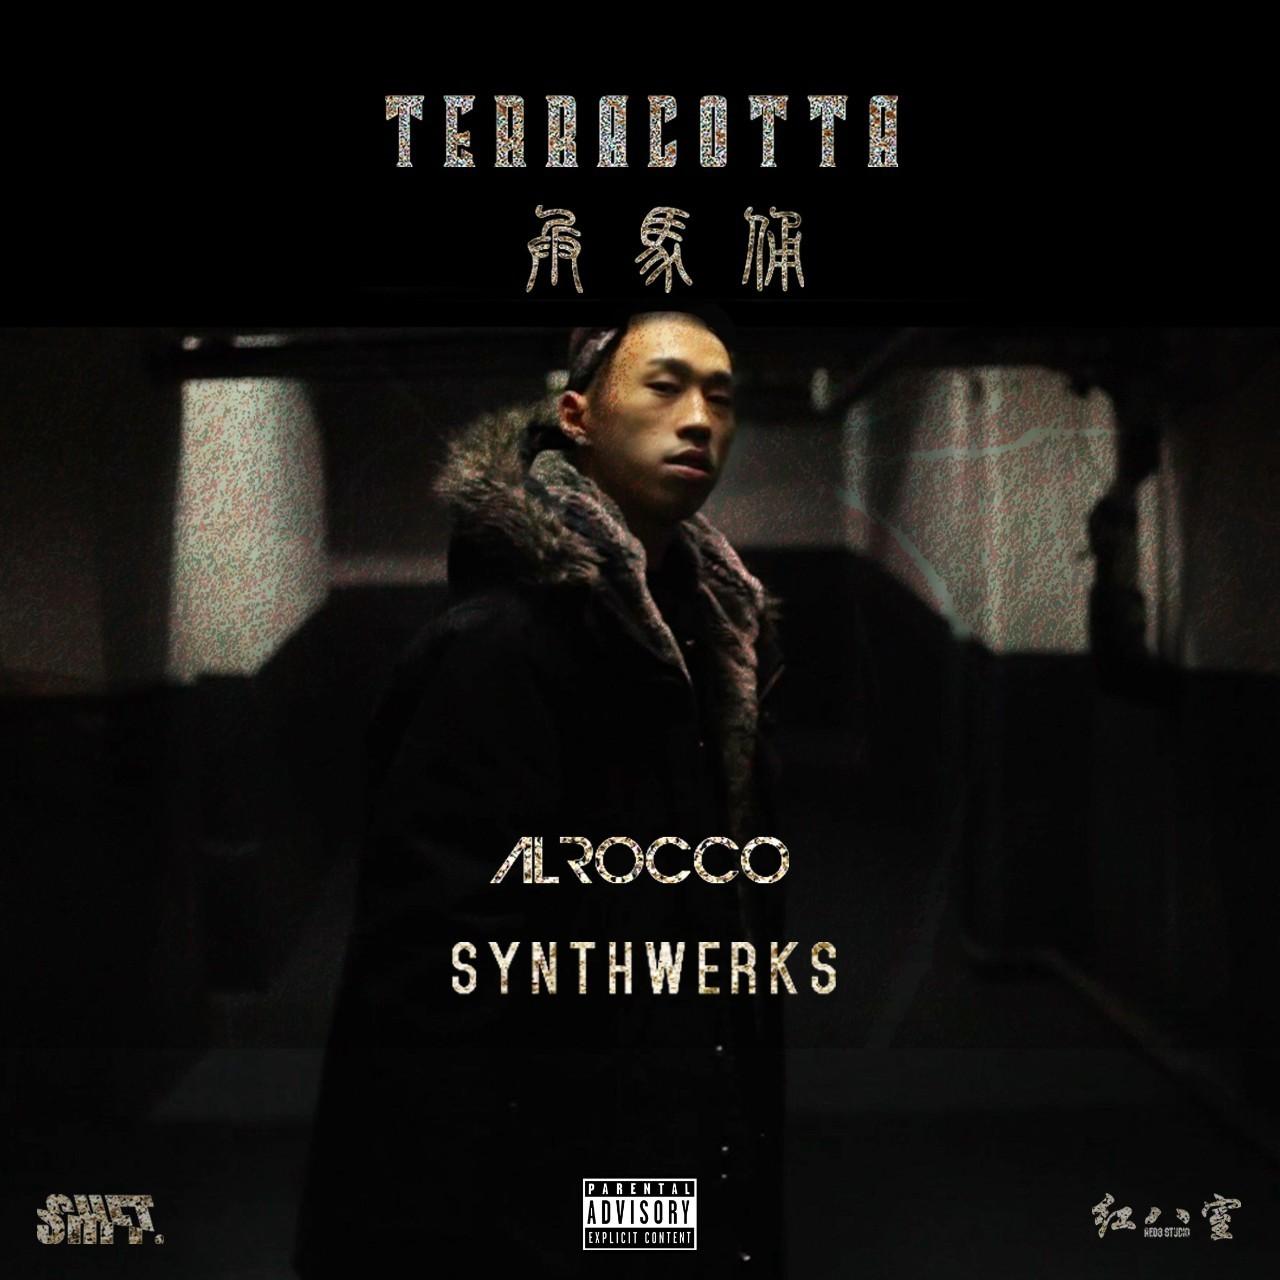 Al Rocco全新EP《Terracotta 兵马俑》重磅上线 - 第1张  | 嘻哈中国